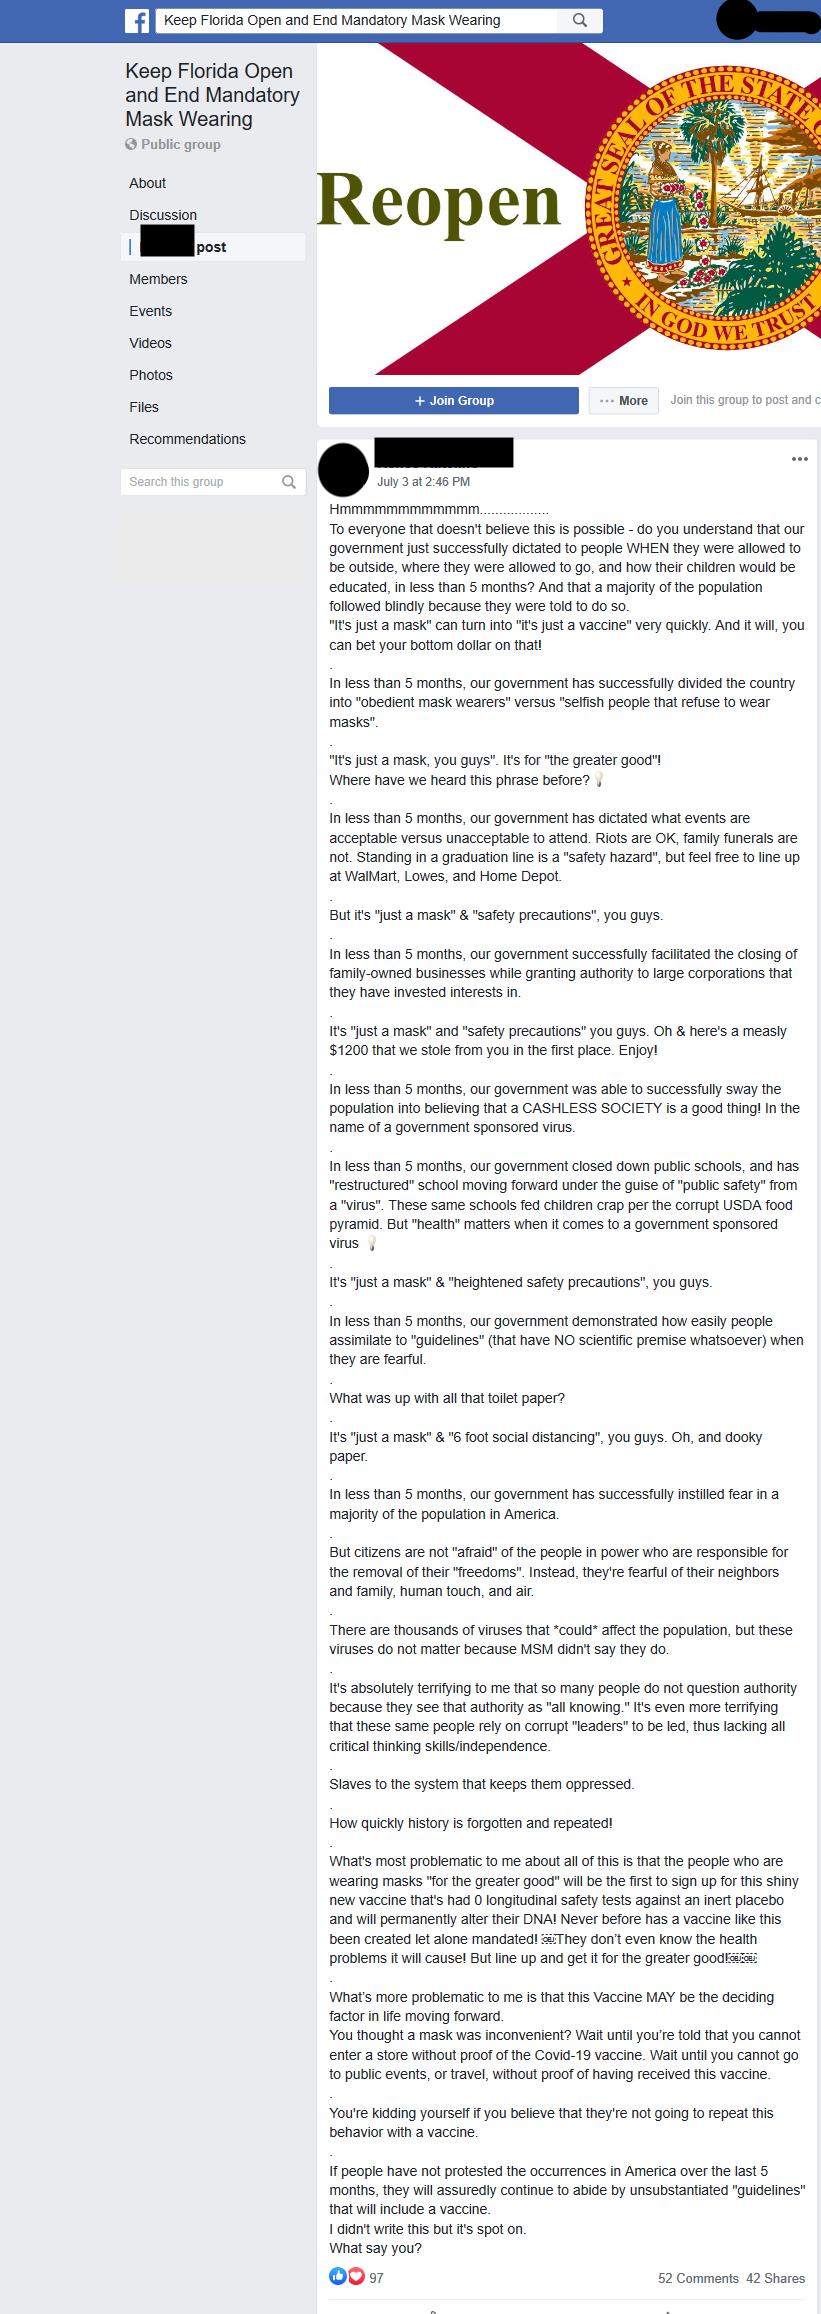 Keep Florida Open and End Mandatory Mask Wearing Facebook post screenshot 4